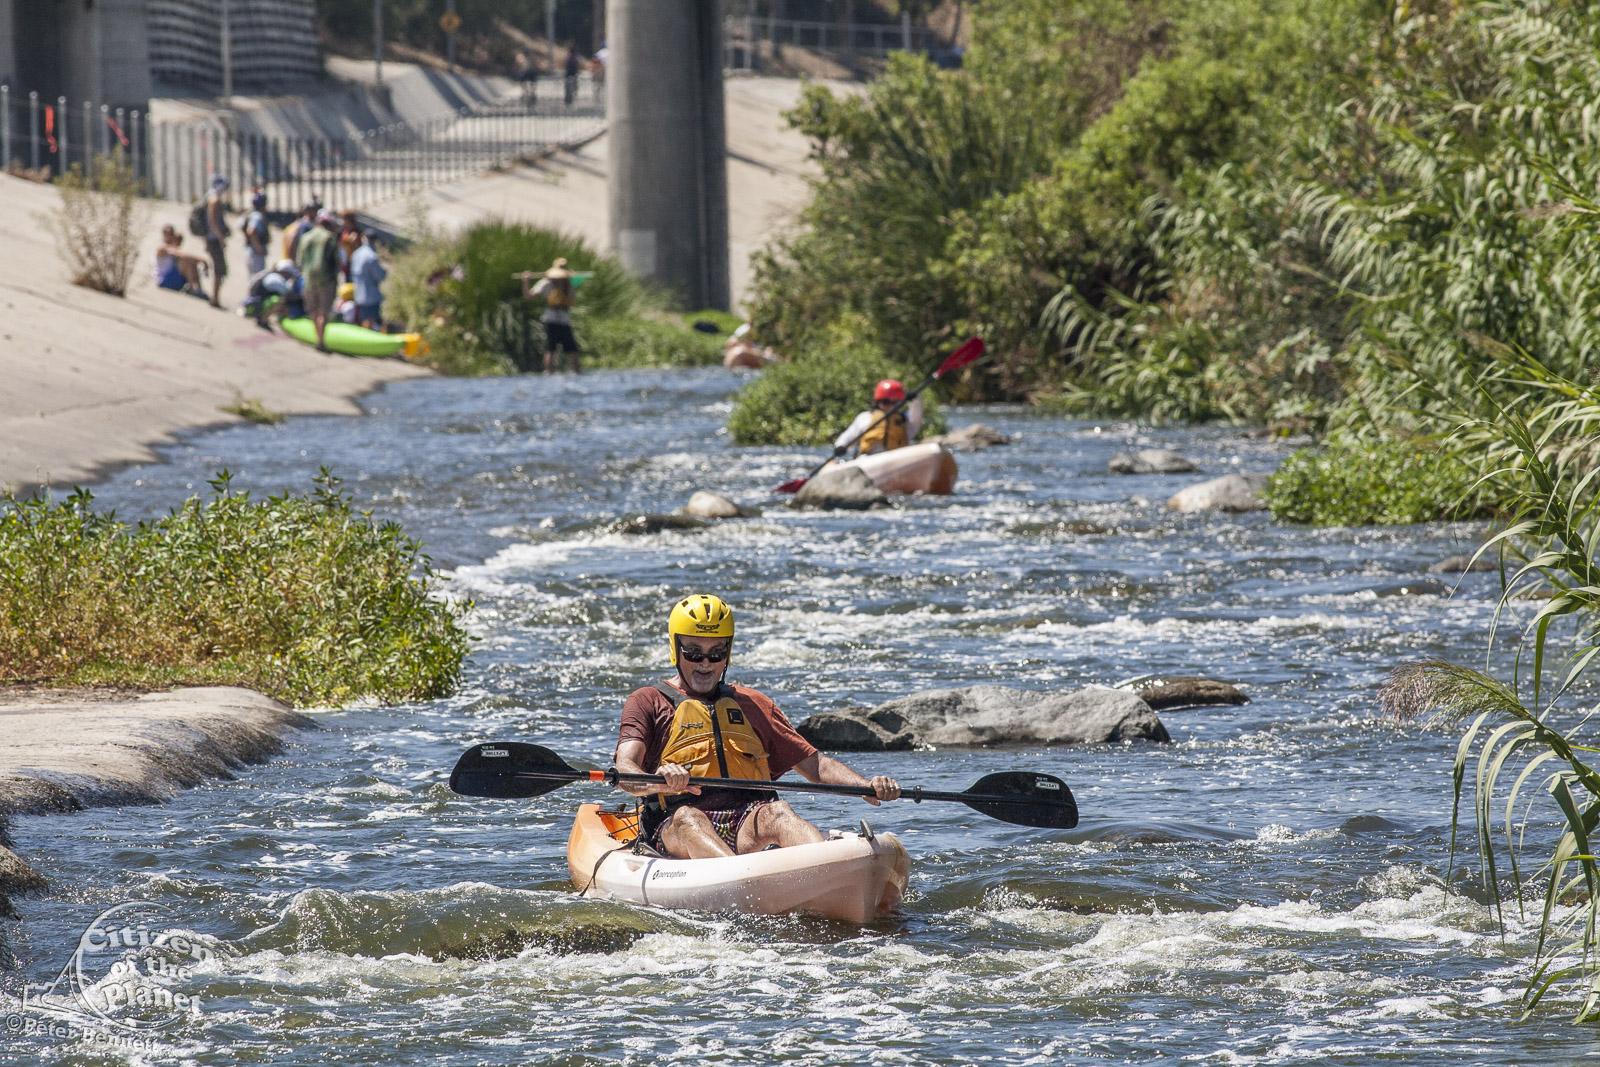 US_CA_48_3879_la_river_boat_race.jpg